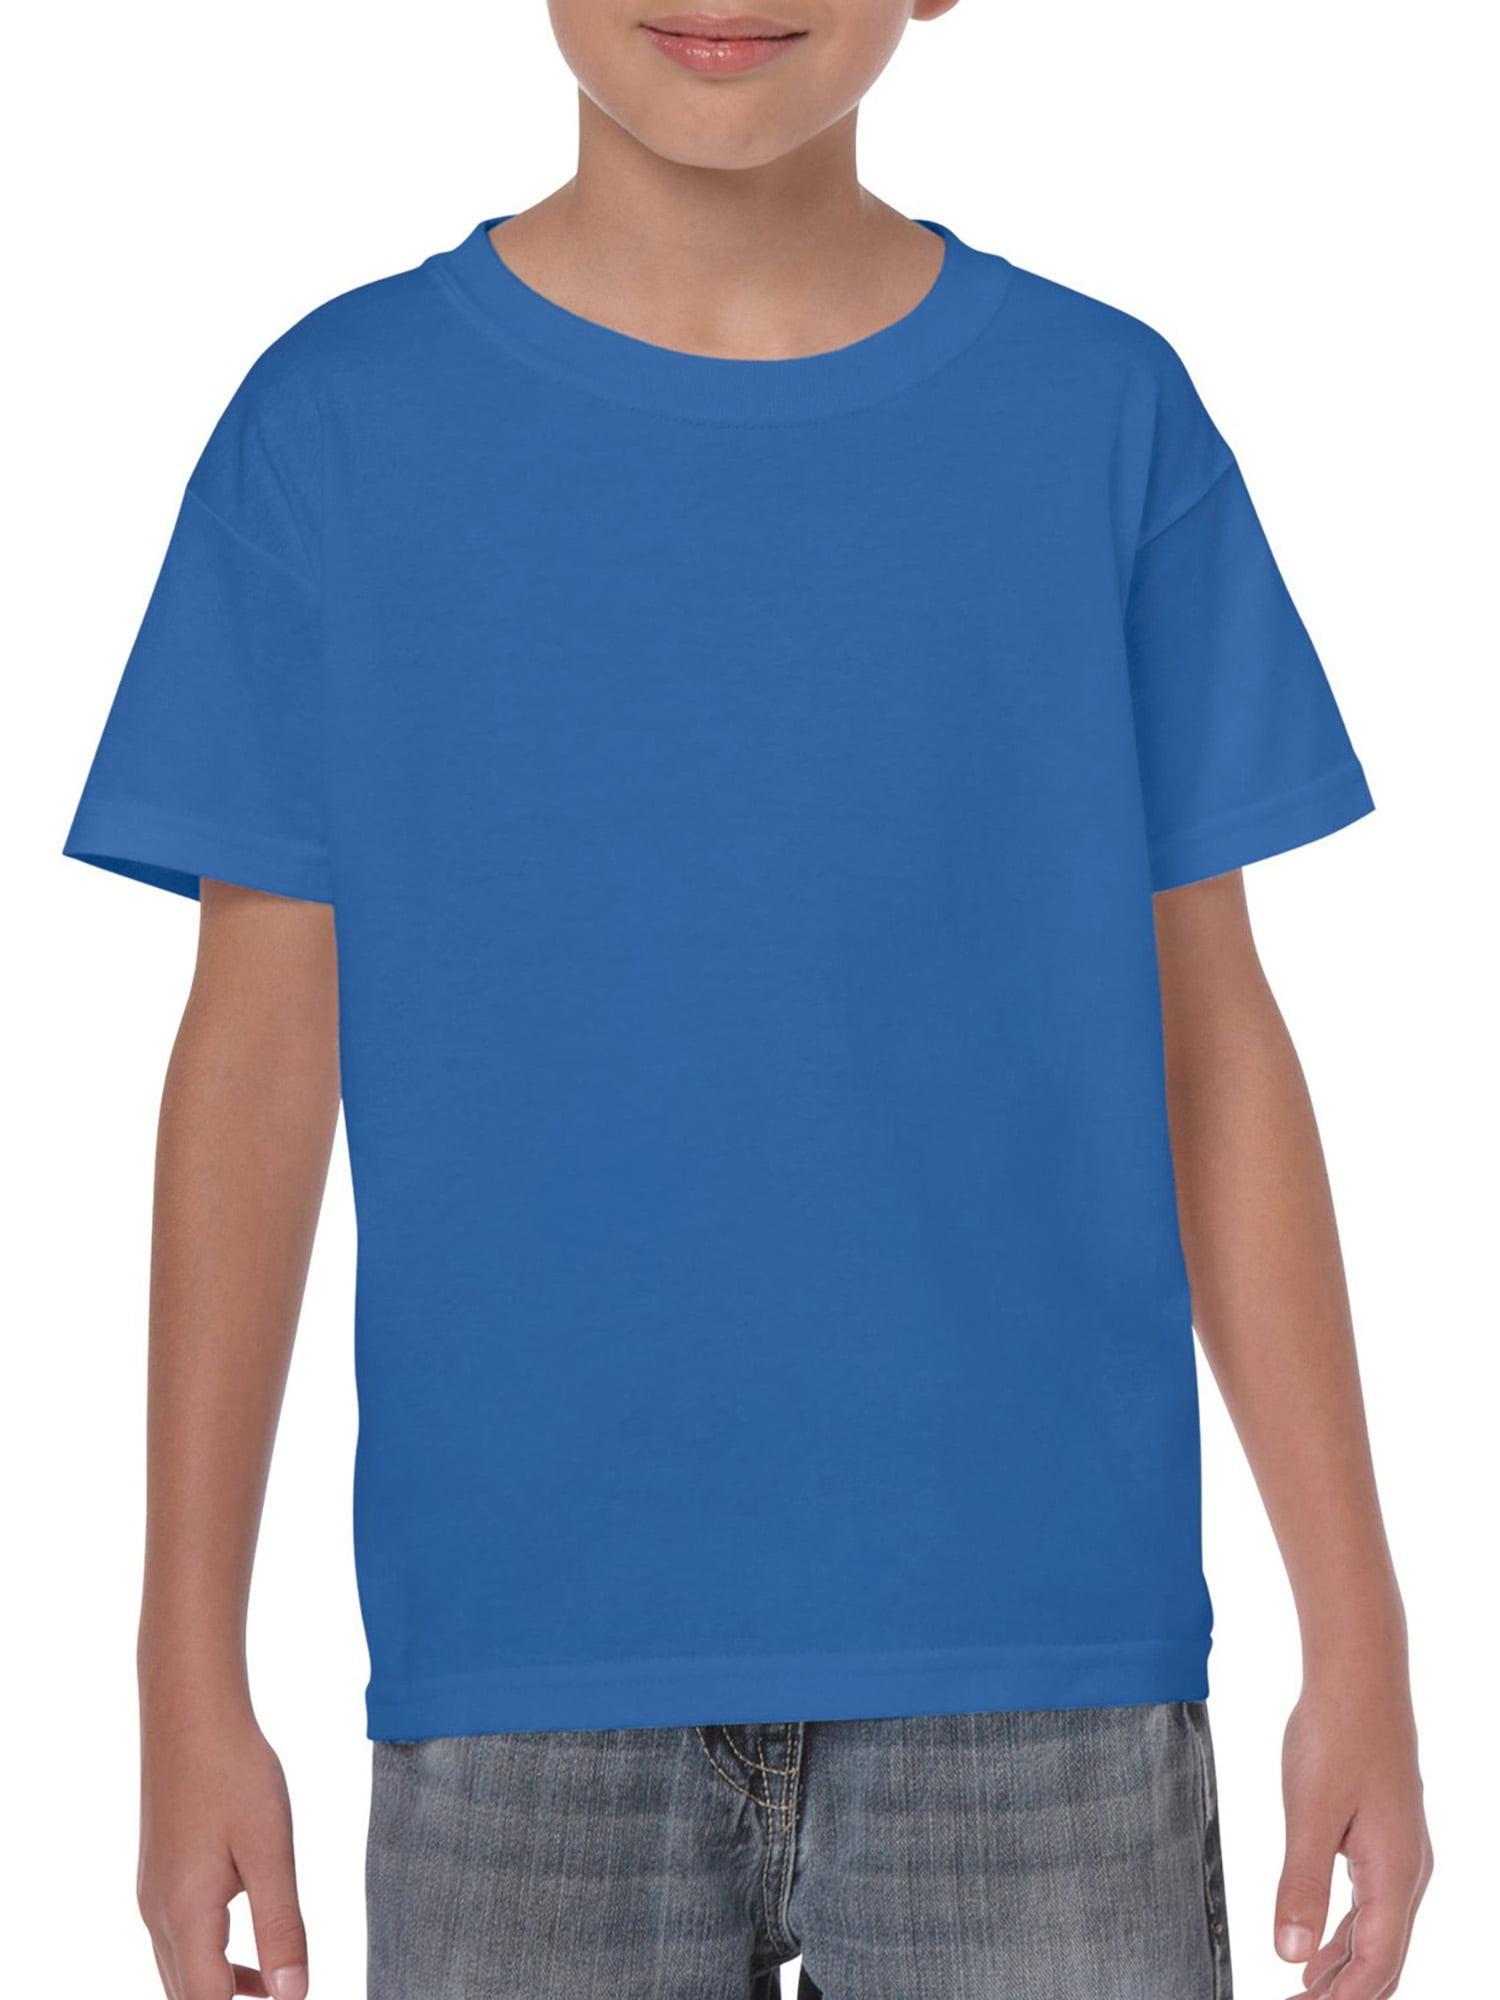 navely Kids Boy Girl Shirt NASCAR Tshirt Infants Toddlers T Shirts Short Sleeve for Tollder Boys Girls T-Shirt